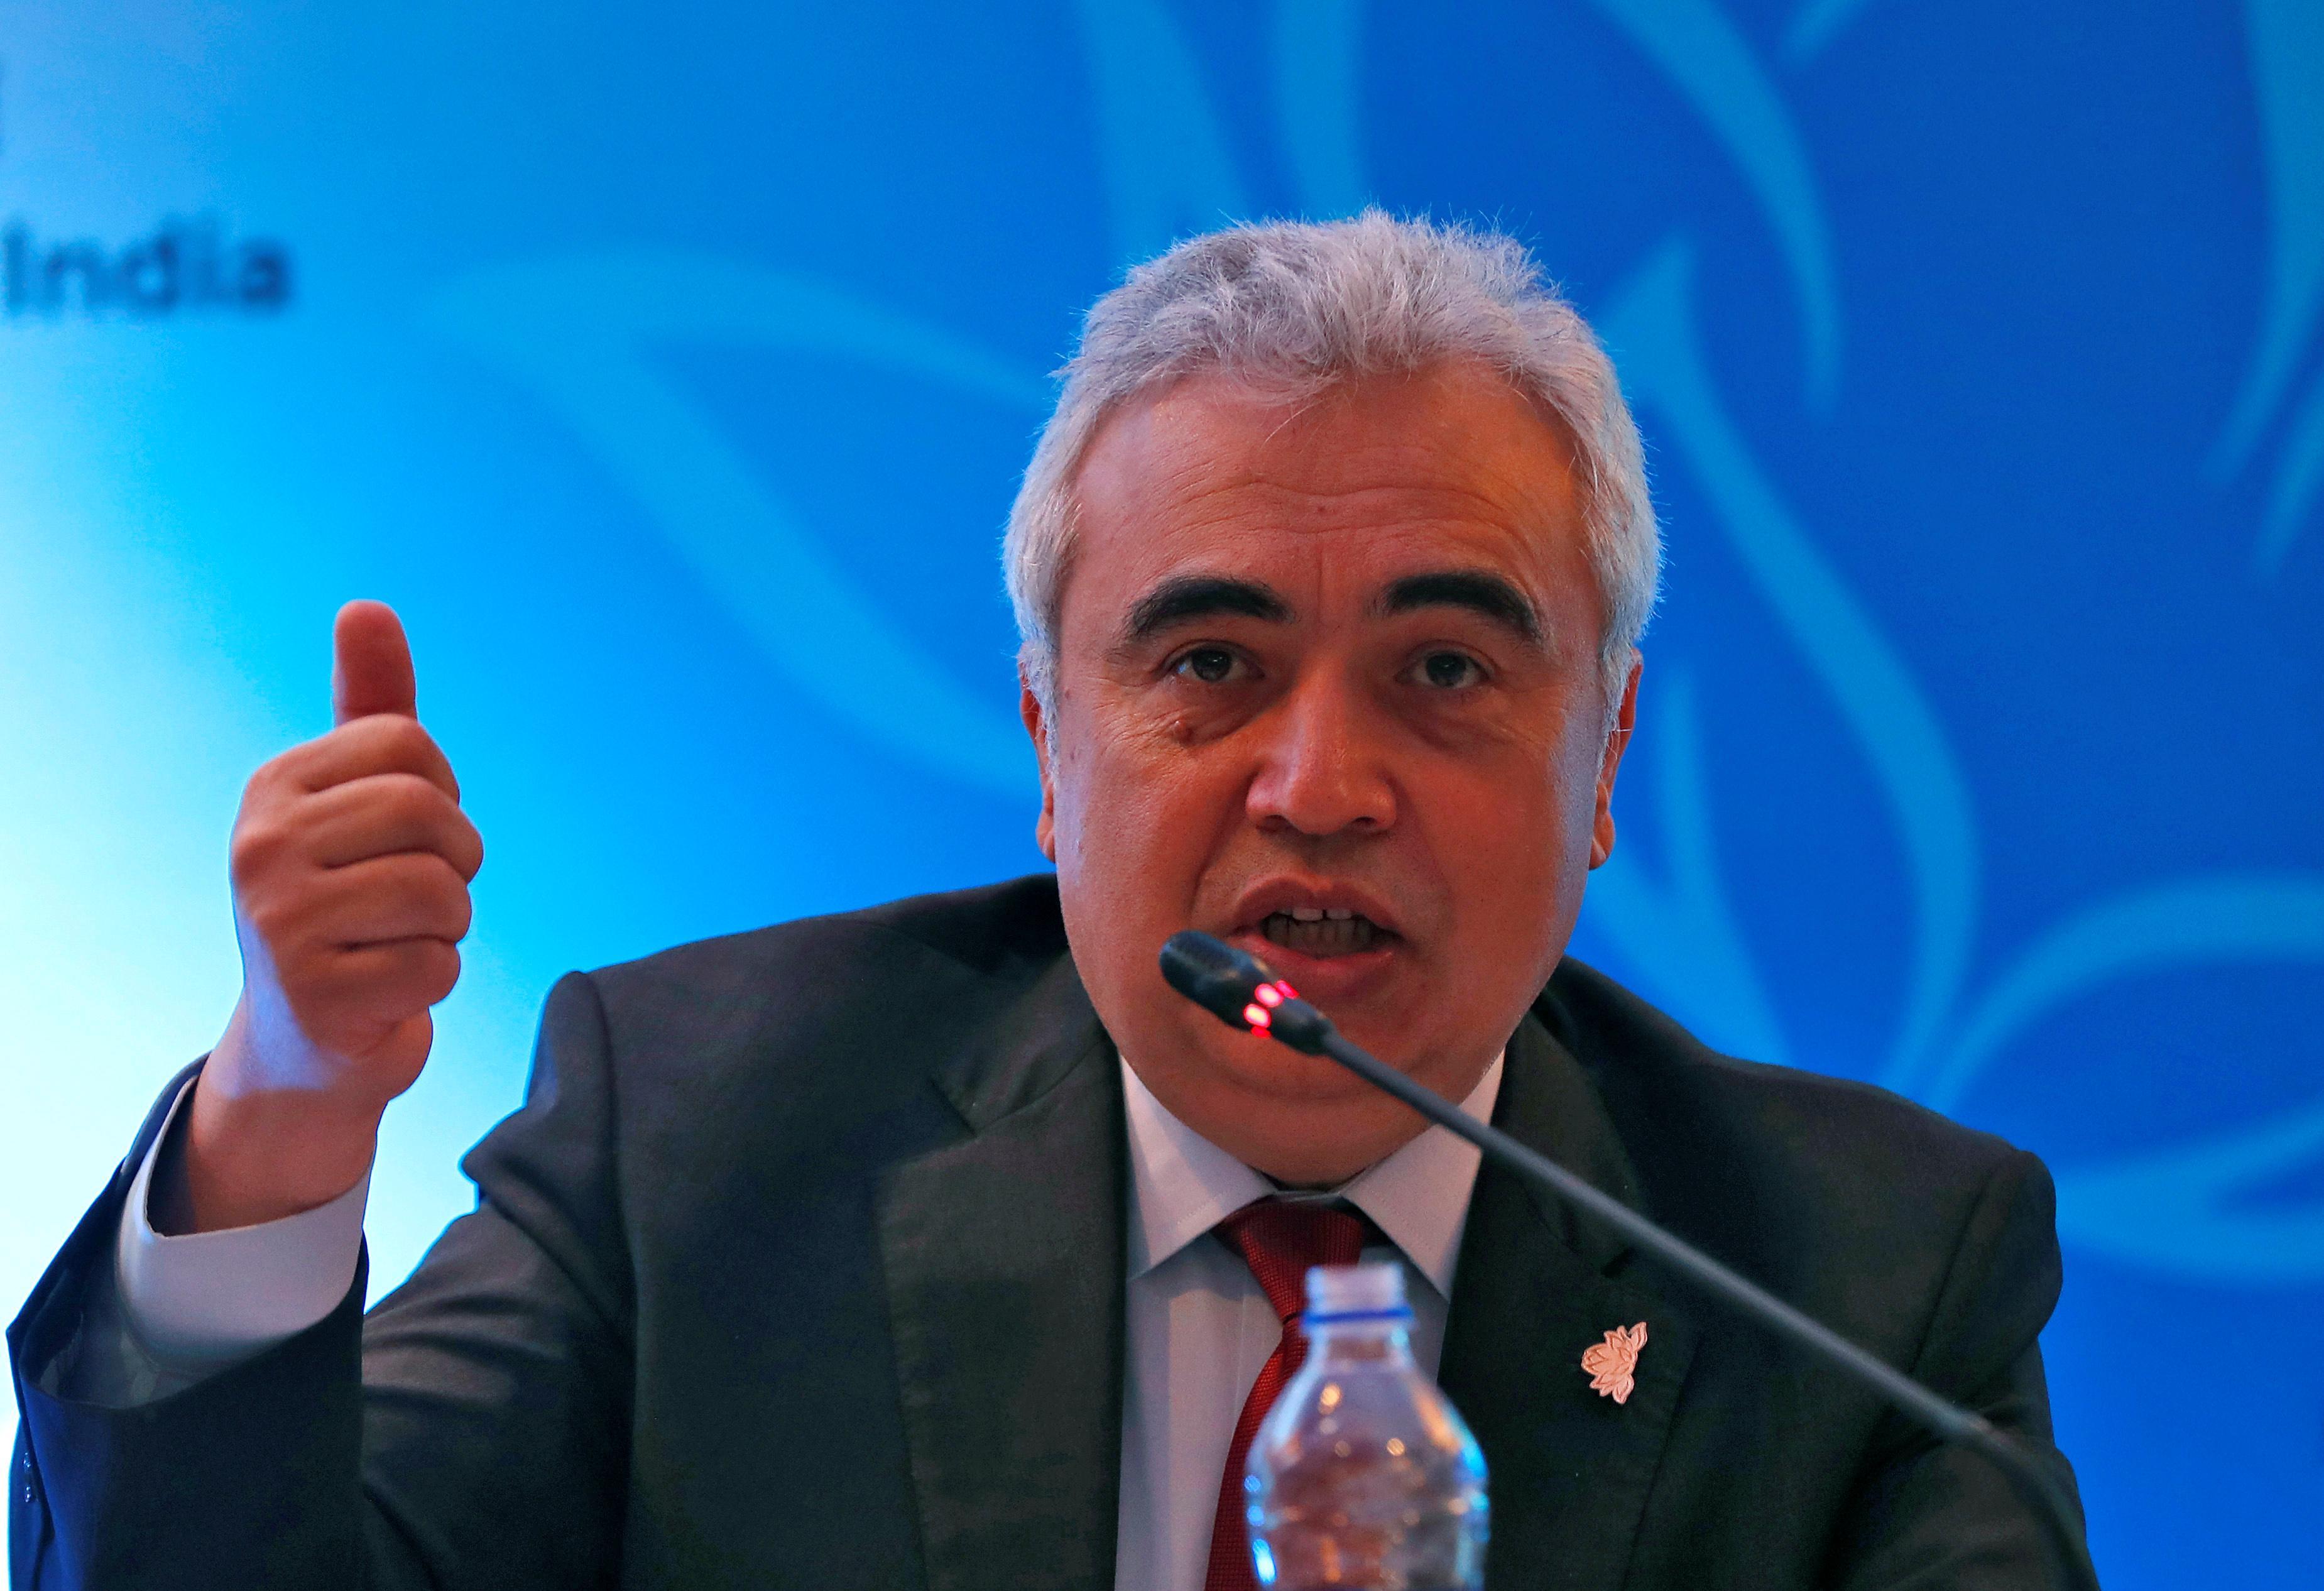 Gulf tanker attacks threaten energy security, IEA's Birol says